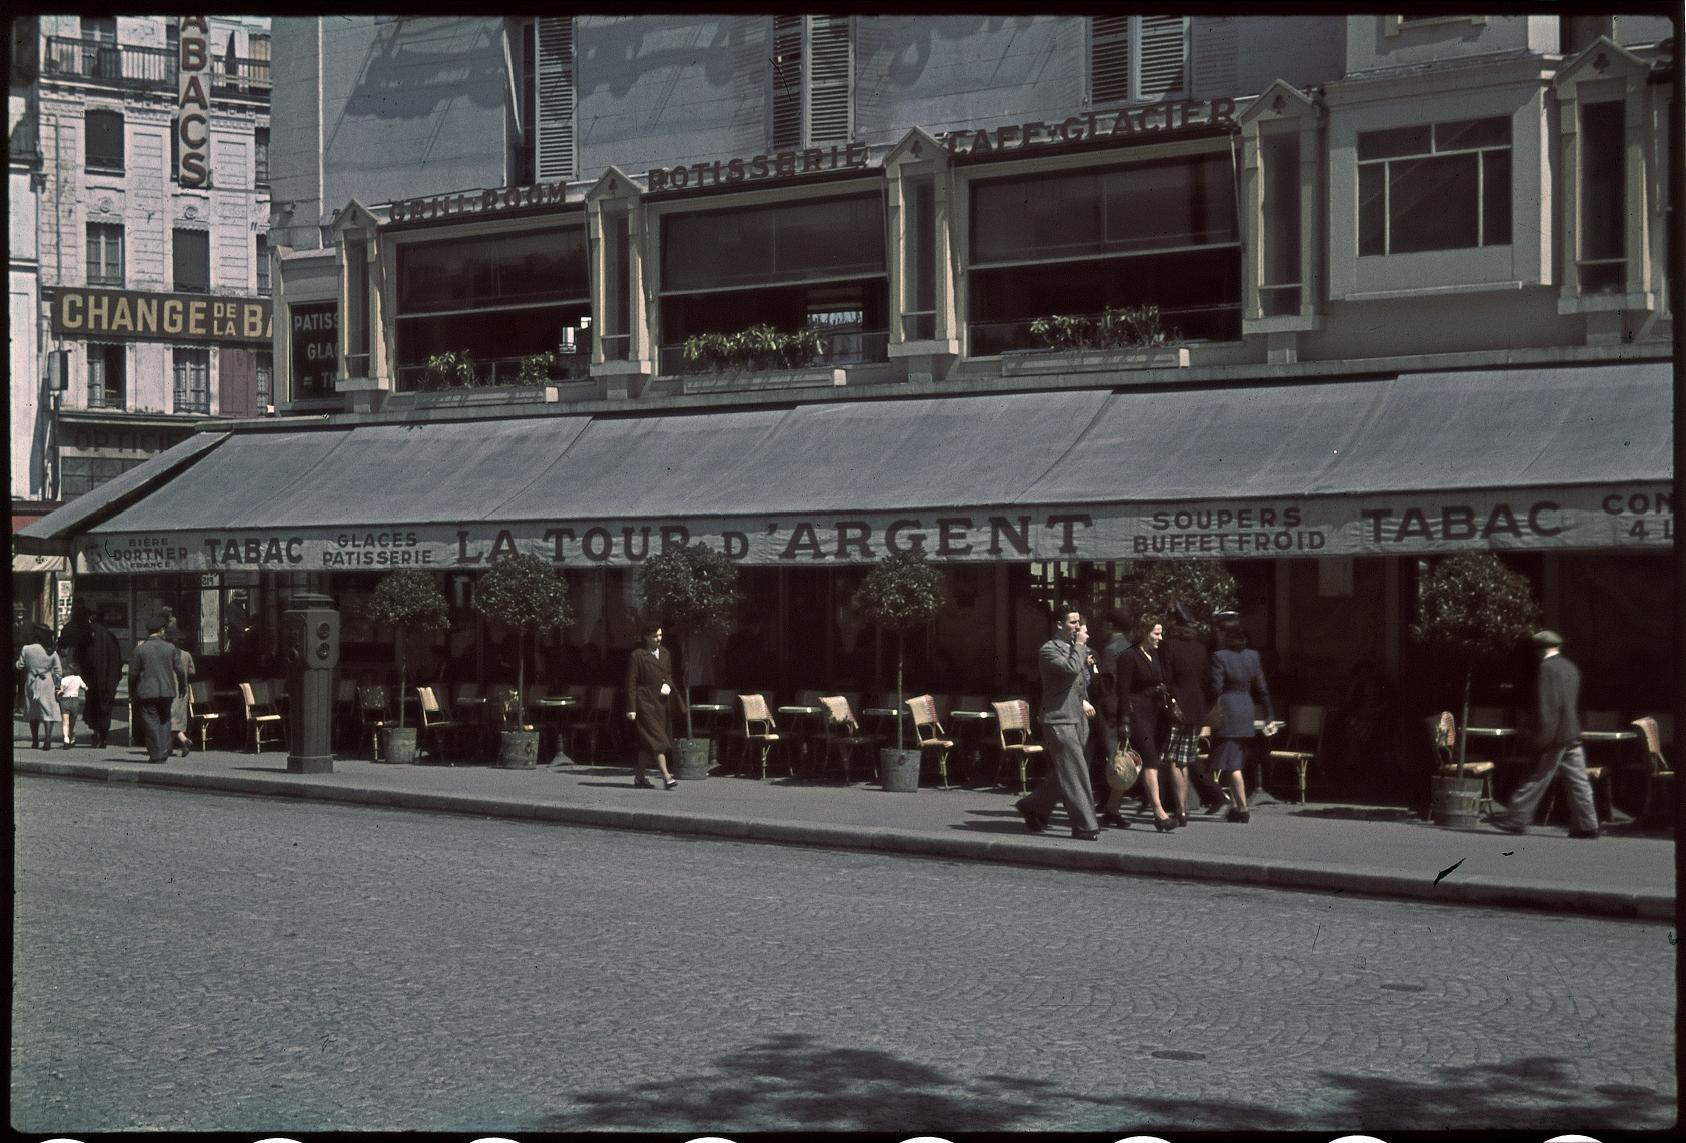 Кафе-ресторан Серебряная башня на площади Бастилии